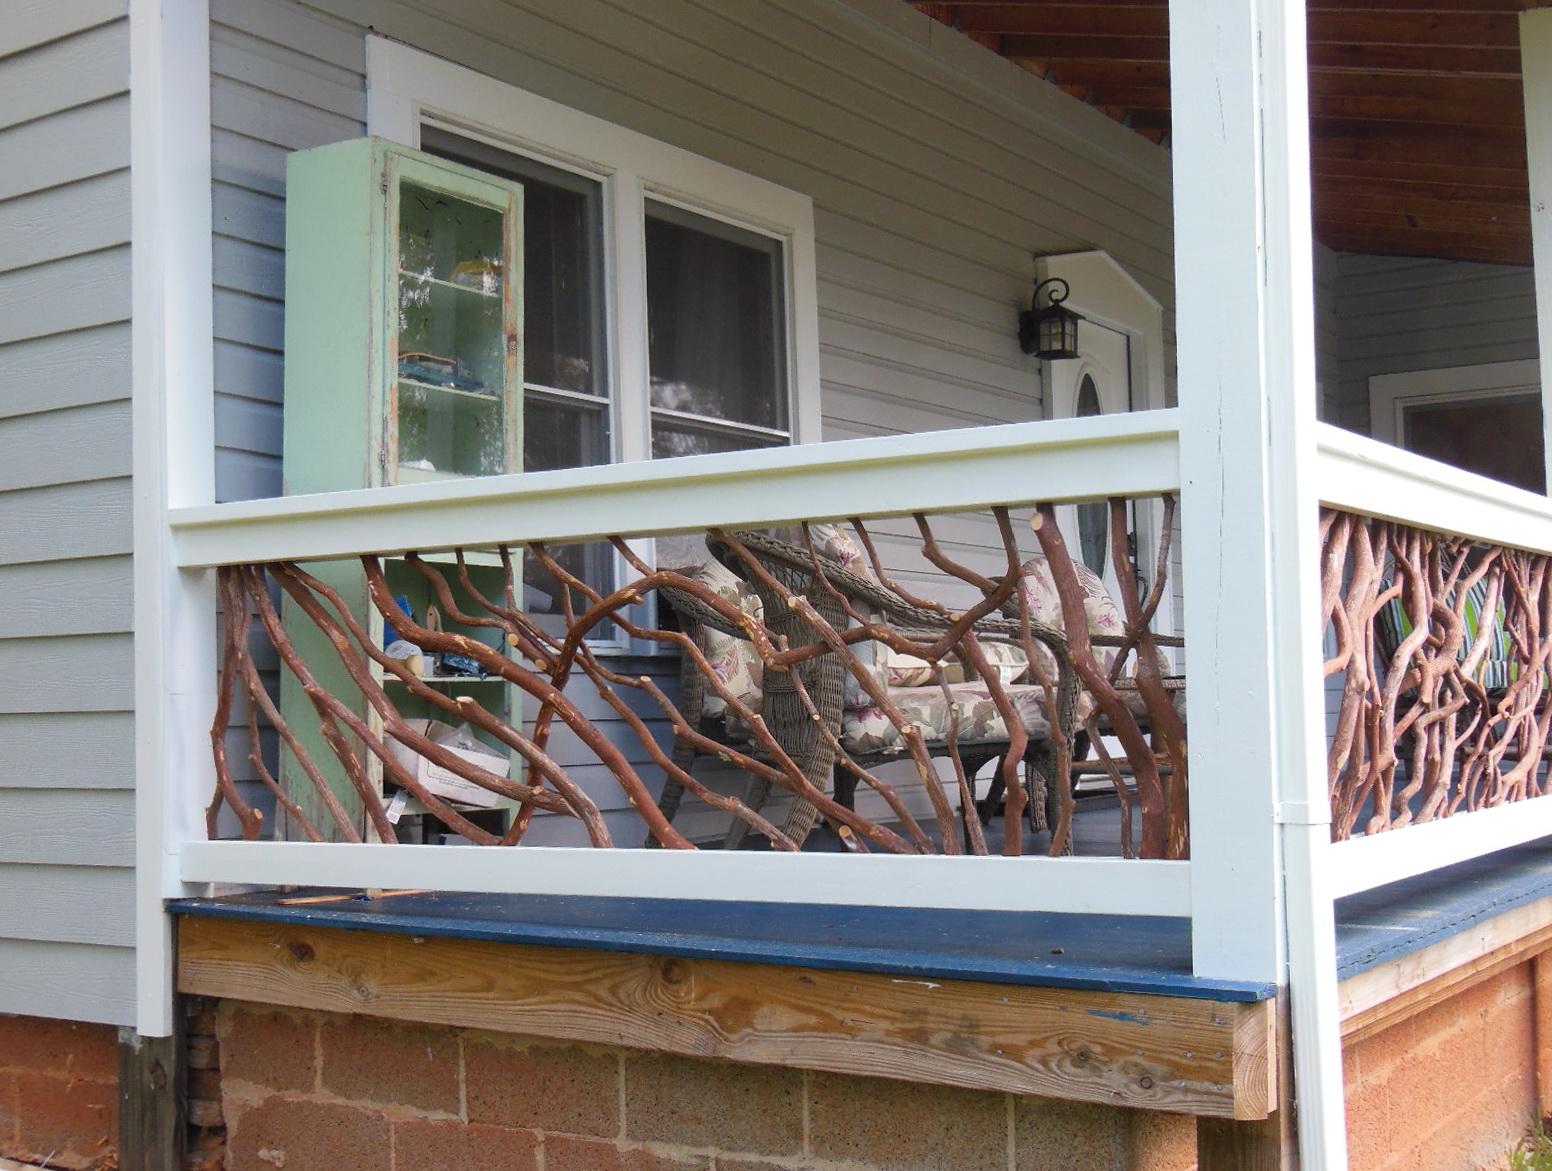 Concrete Porch Railing Ideas | Home Design Ideas